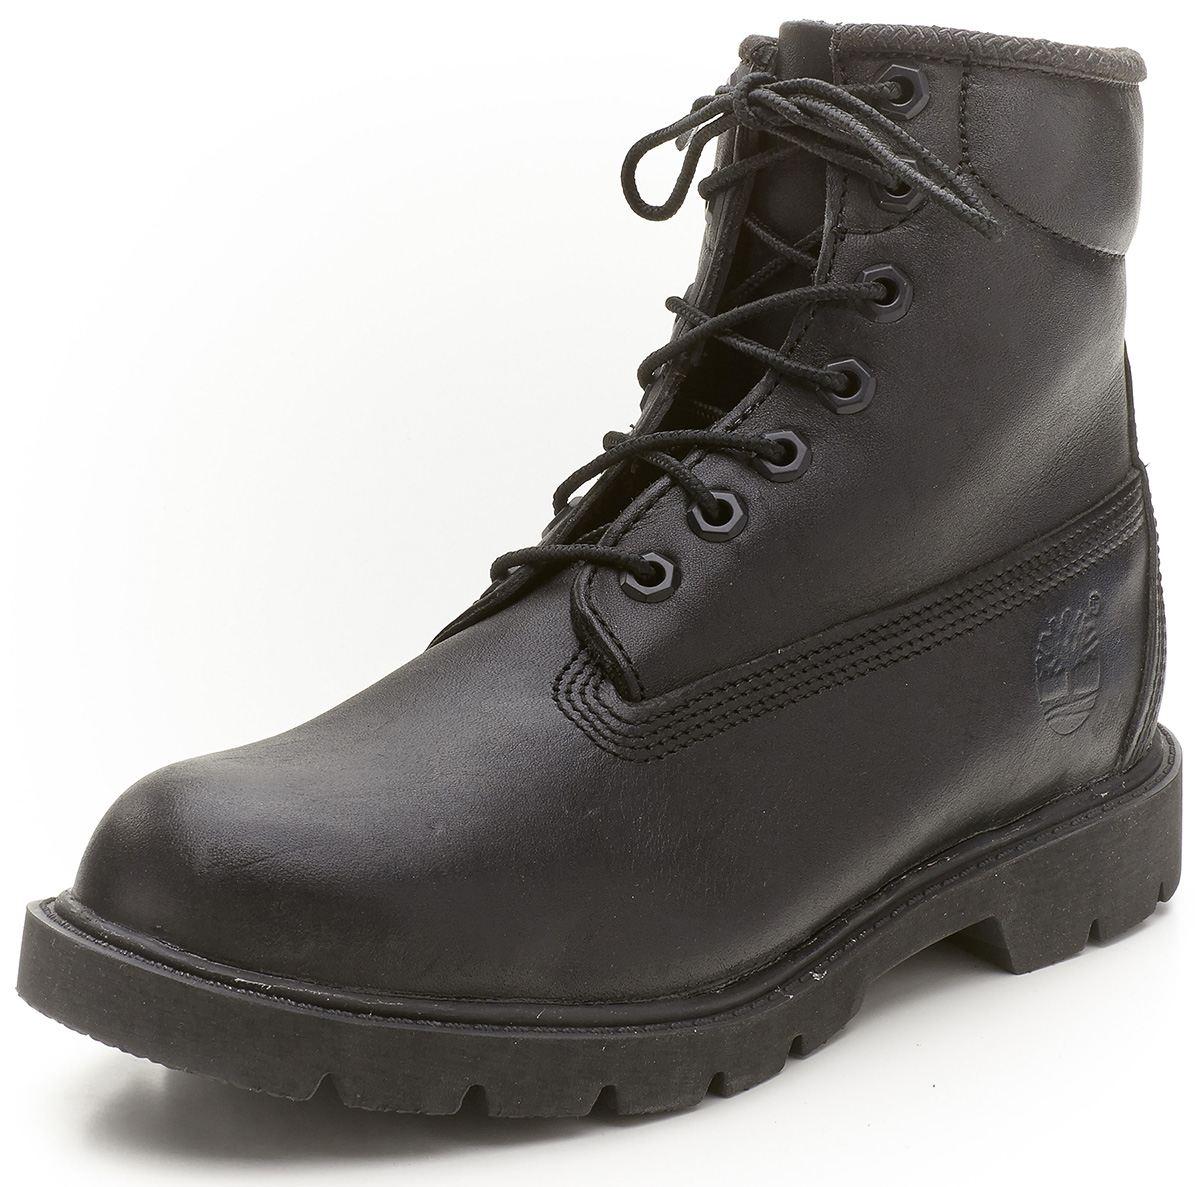 Timberland Basic 6 034 original waterproof black boots